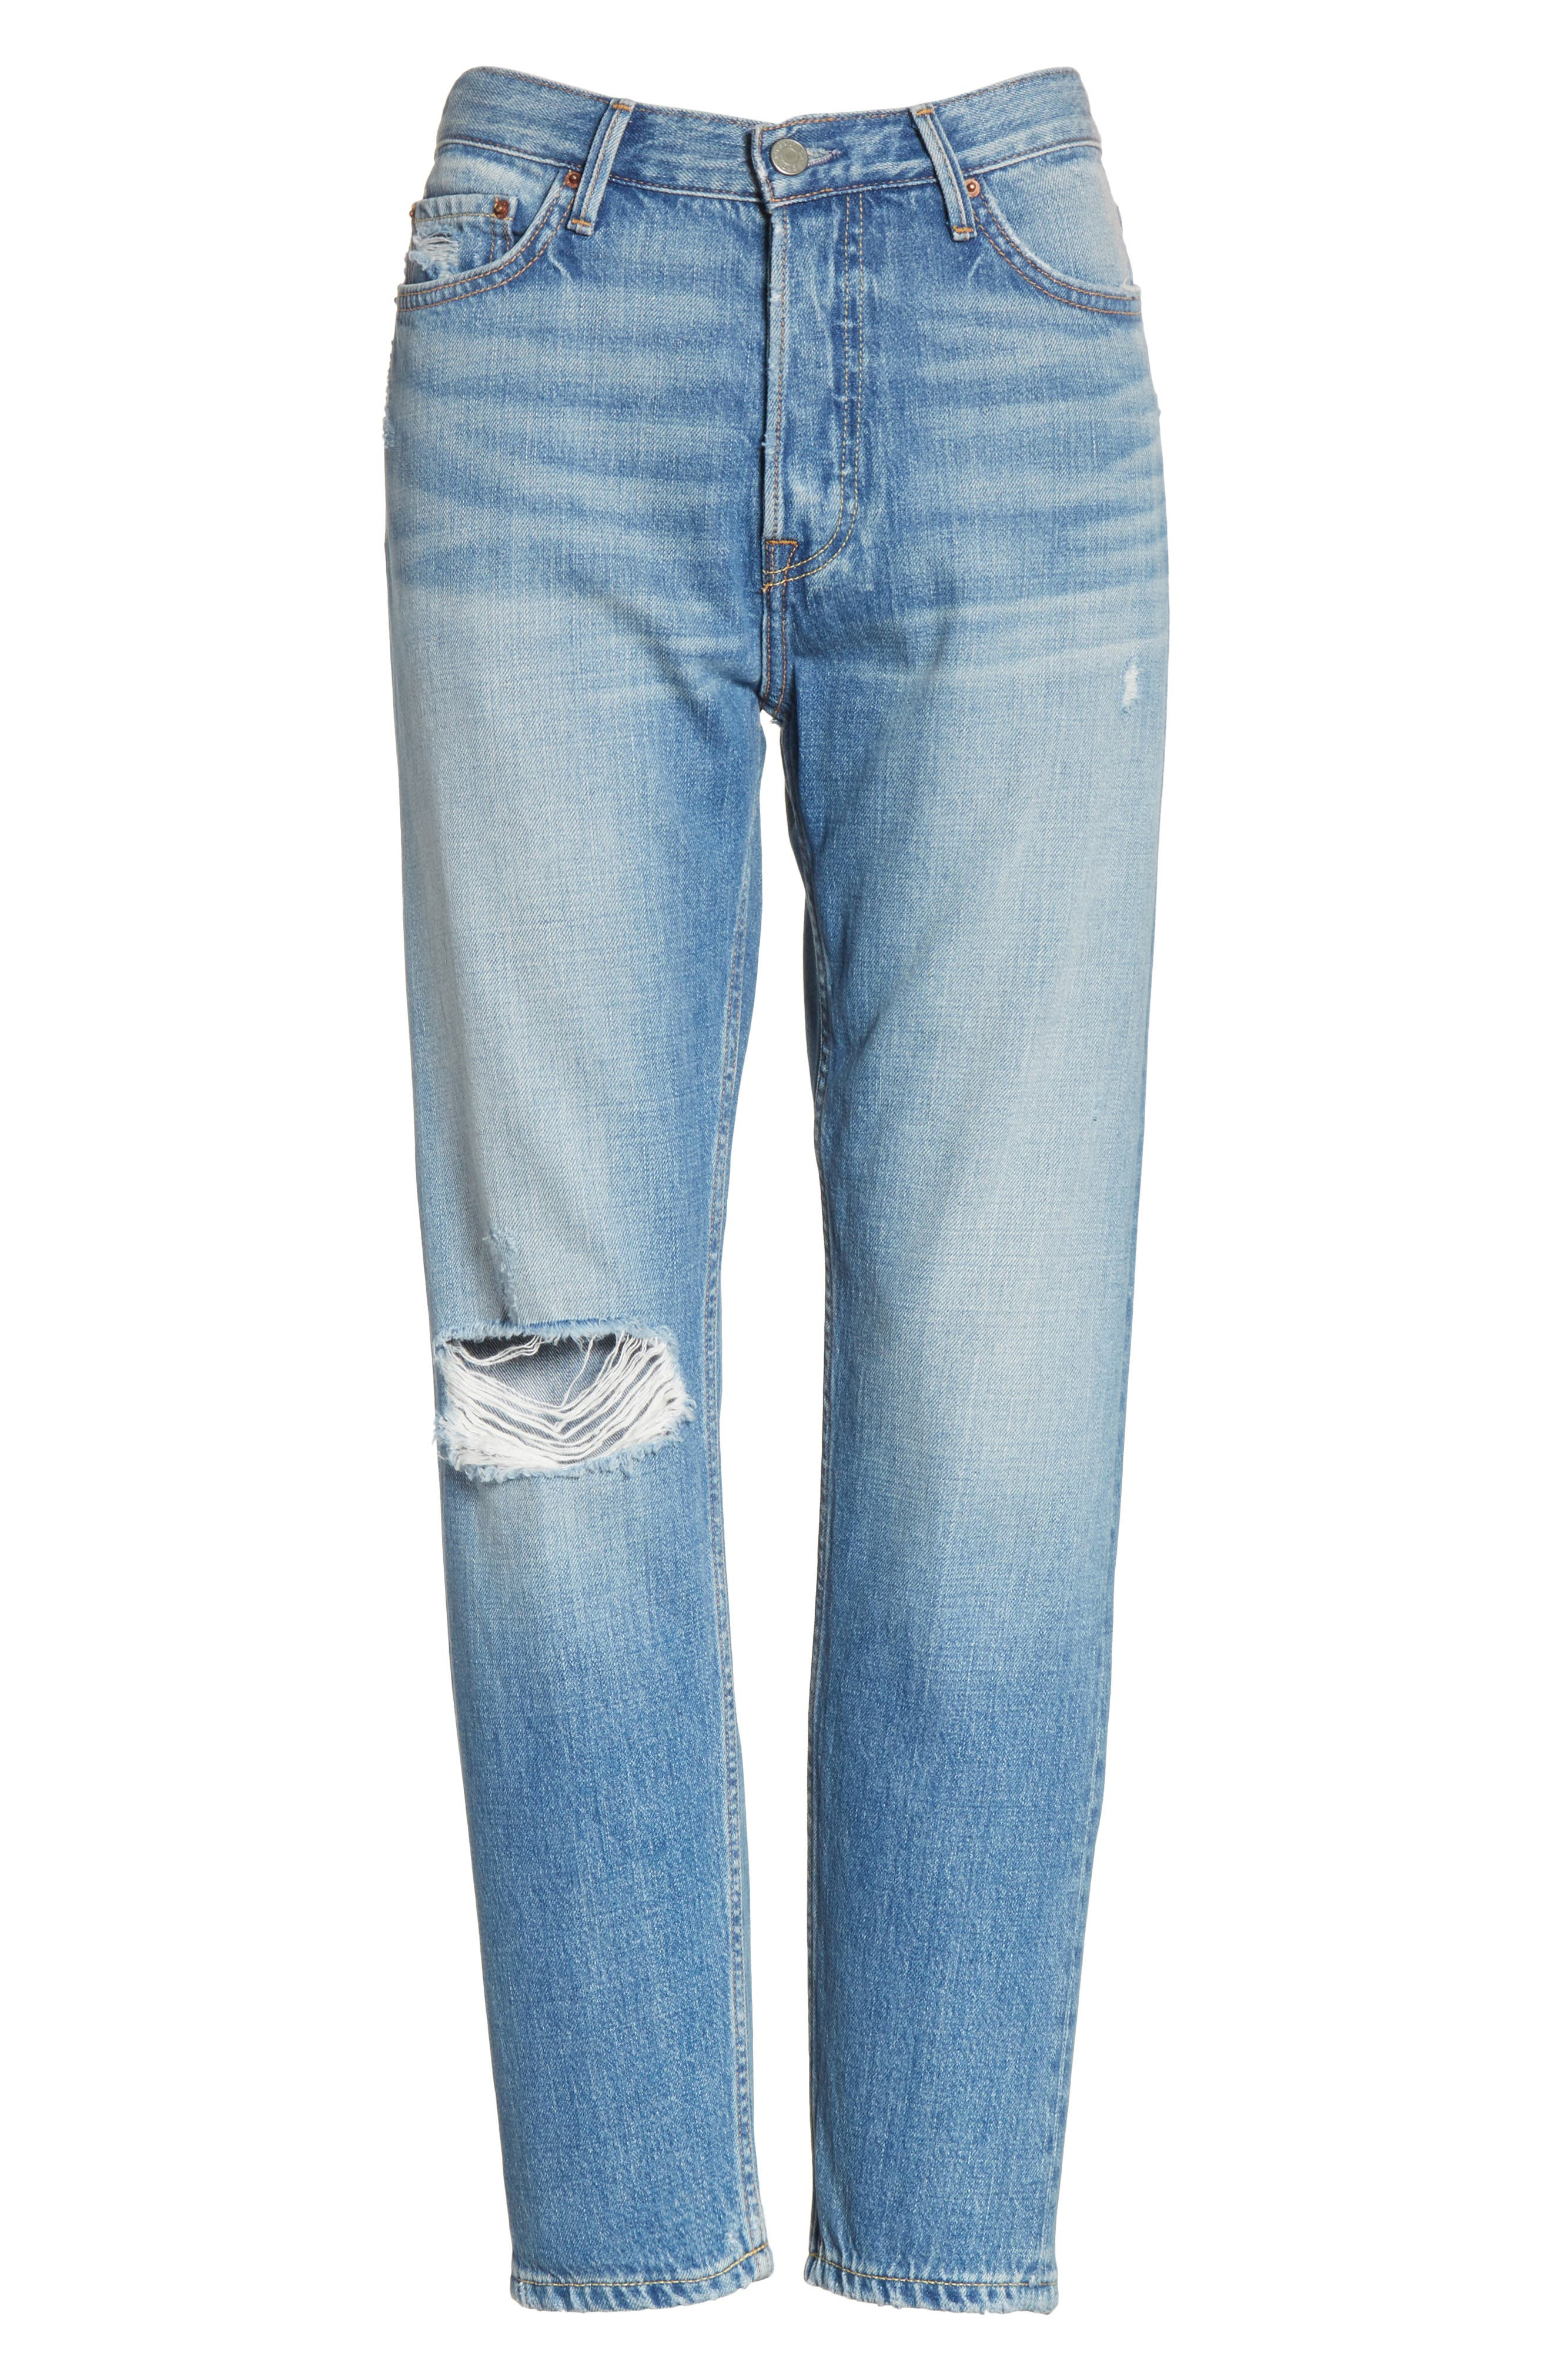 Kiara High Waist Ankle Boyfriend Jeans,                             Alternate thumbnail 7, color,                             464